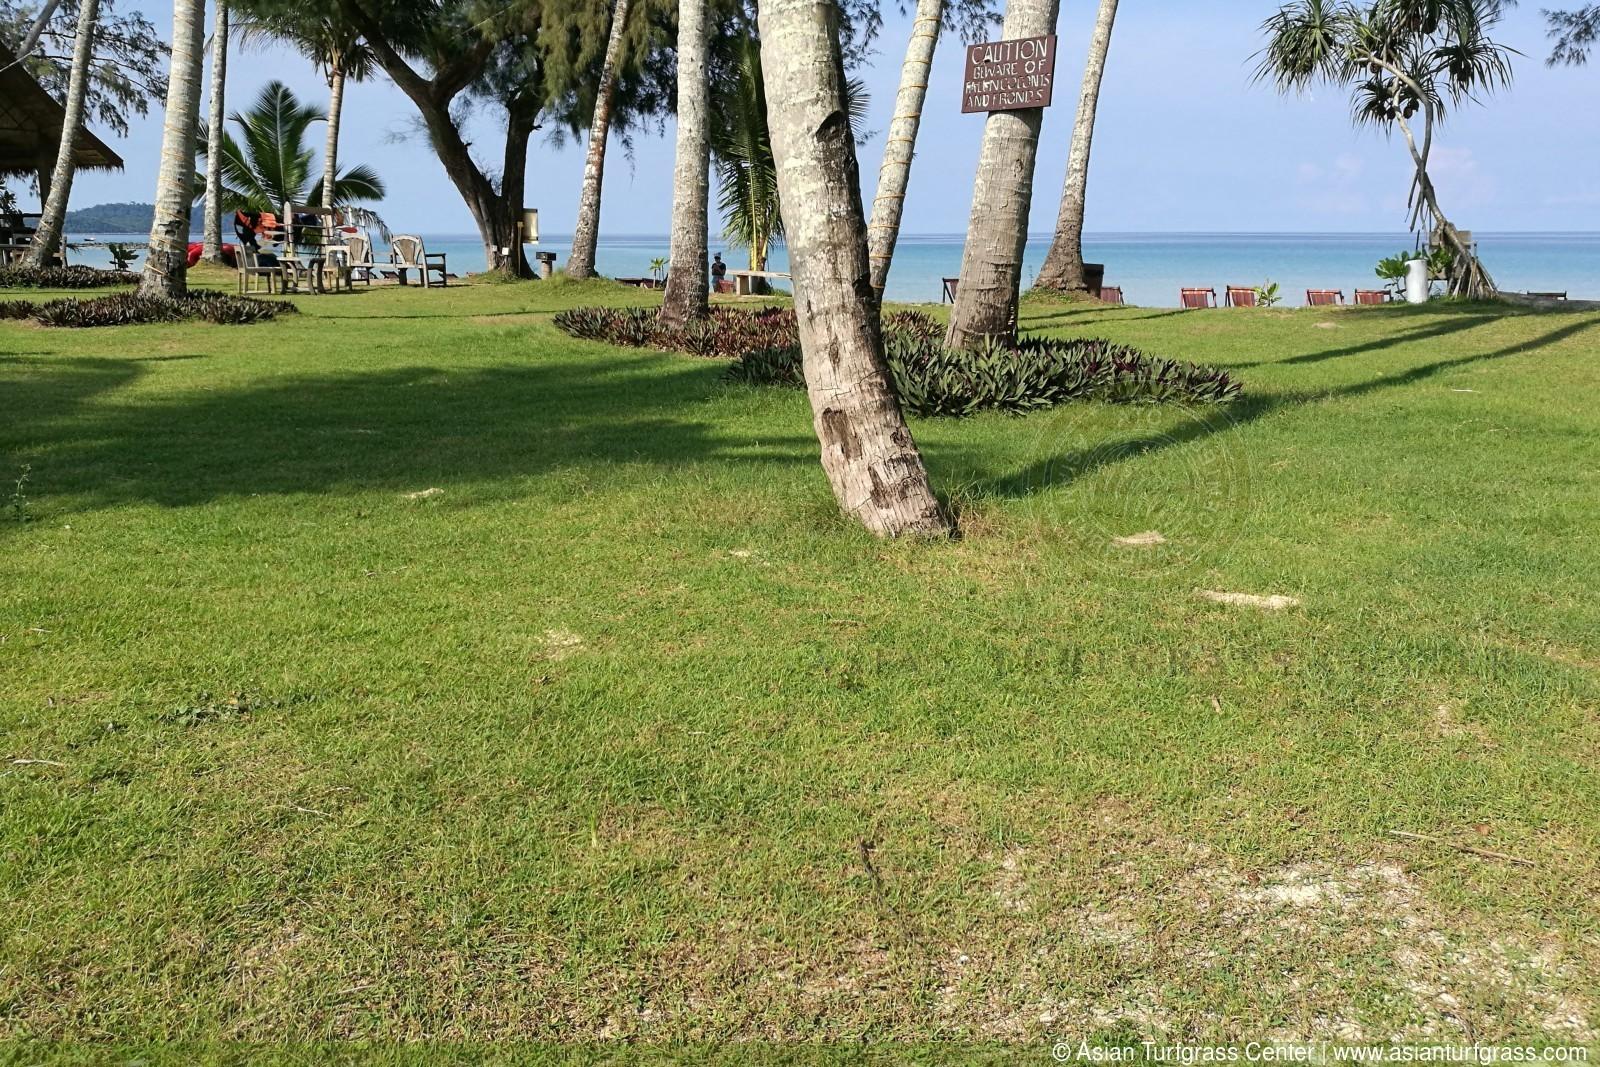 image of seashore paspalum lawn with weeds at Ko Kood, Thailand